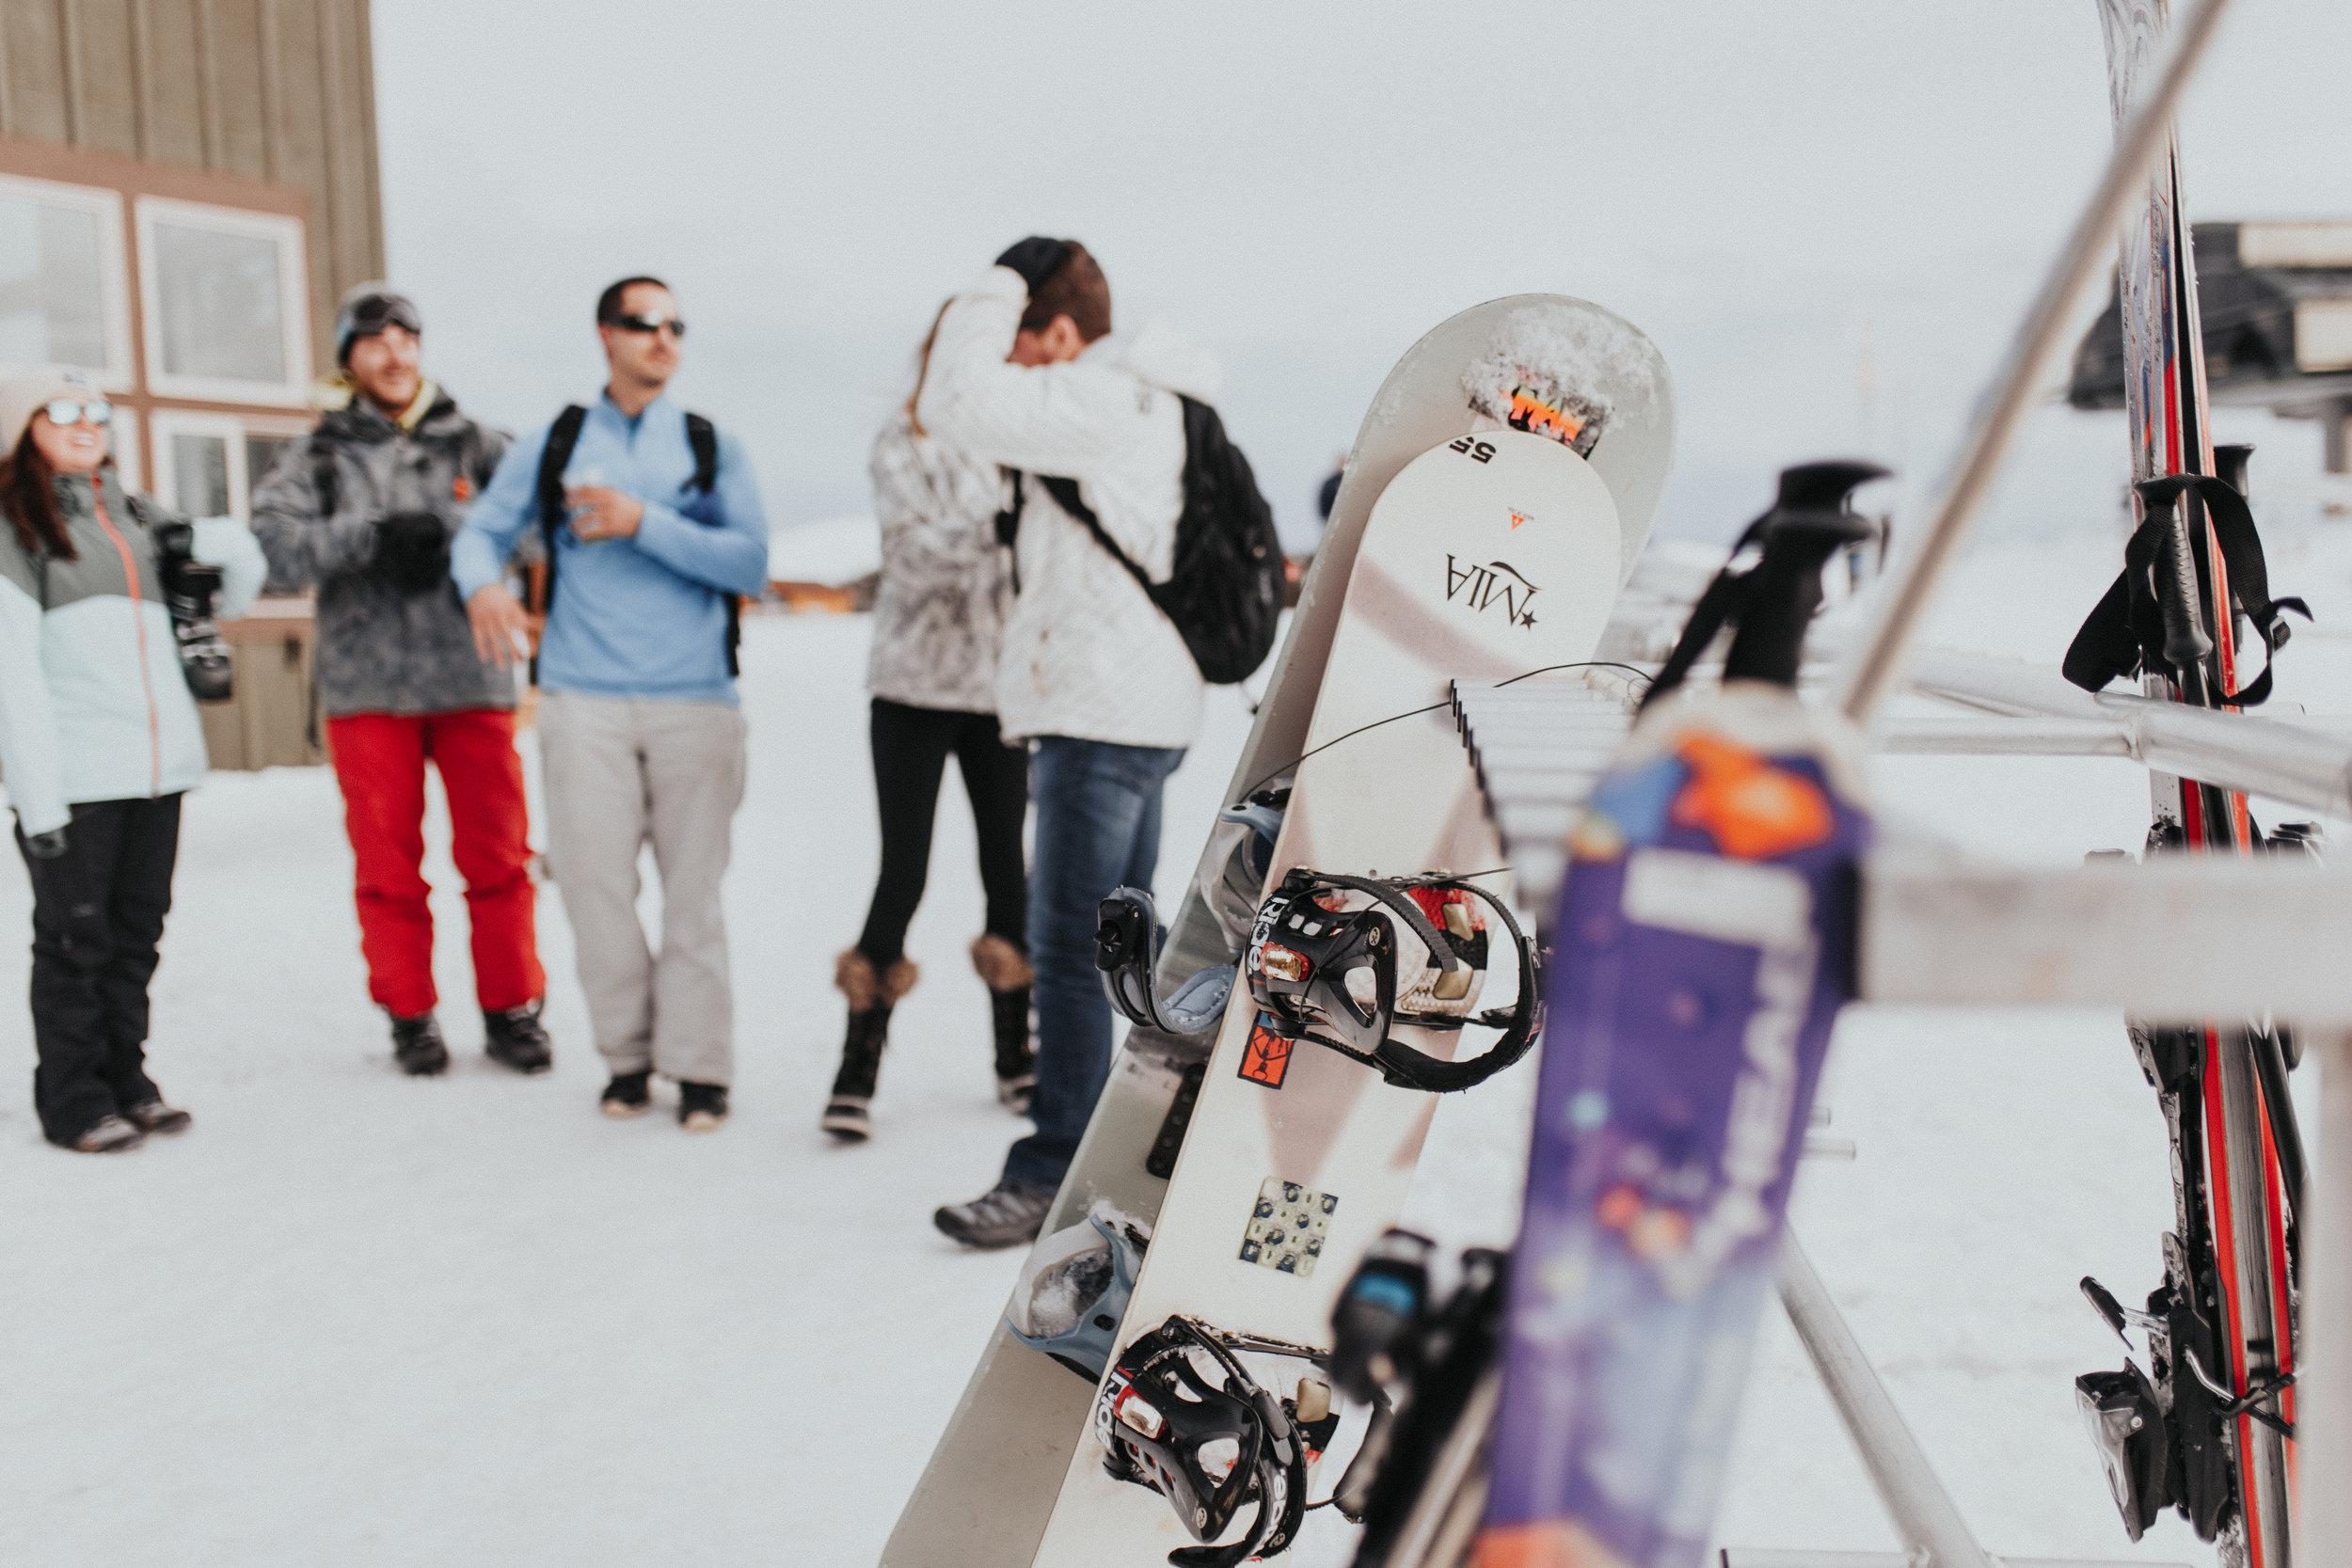 Colorado Rocky Mountain Ski Keystone Engagement Photographer-1.jpg